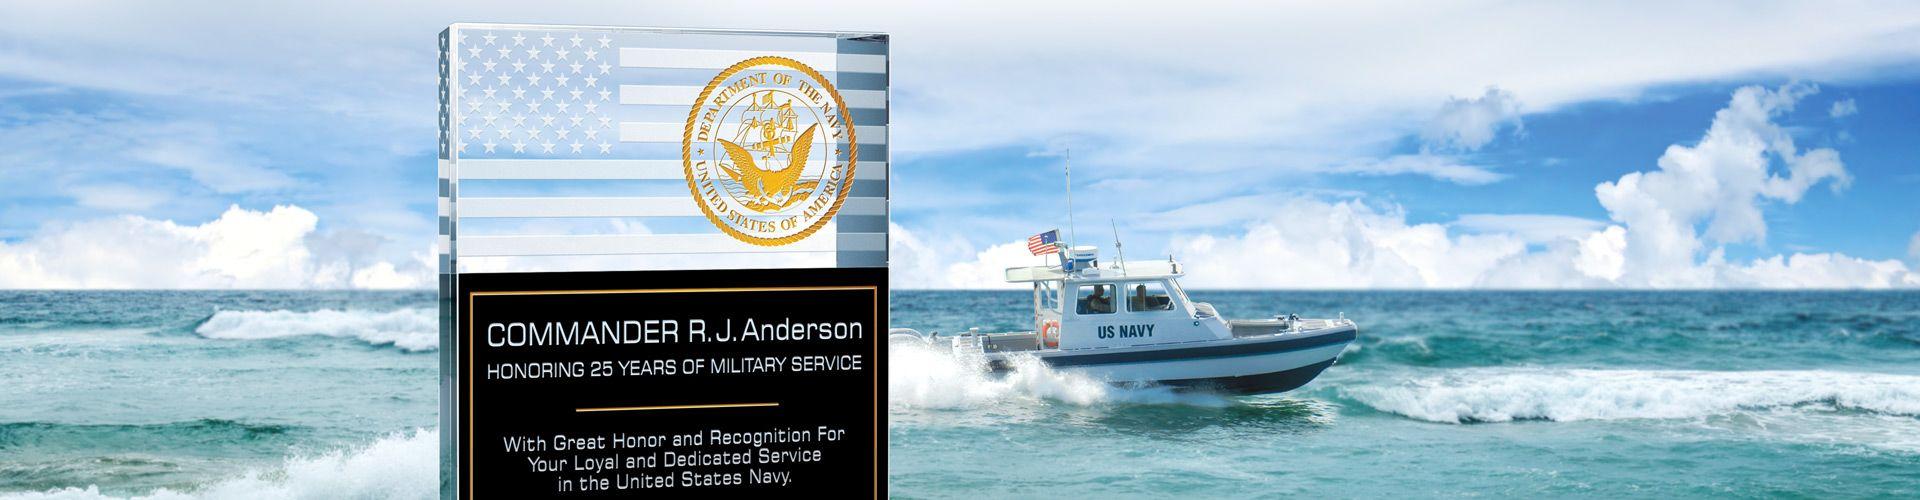 Buy Custom Crystal Plaques & Awards for Navy Members & Veterans - Banner 1